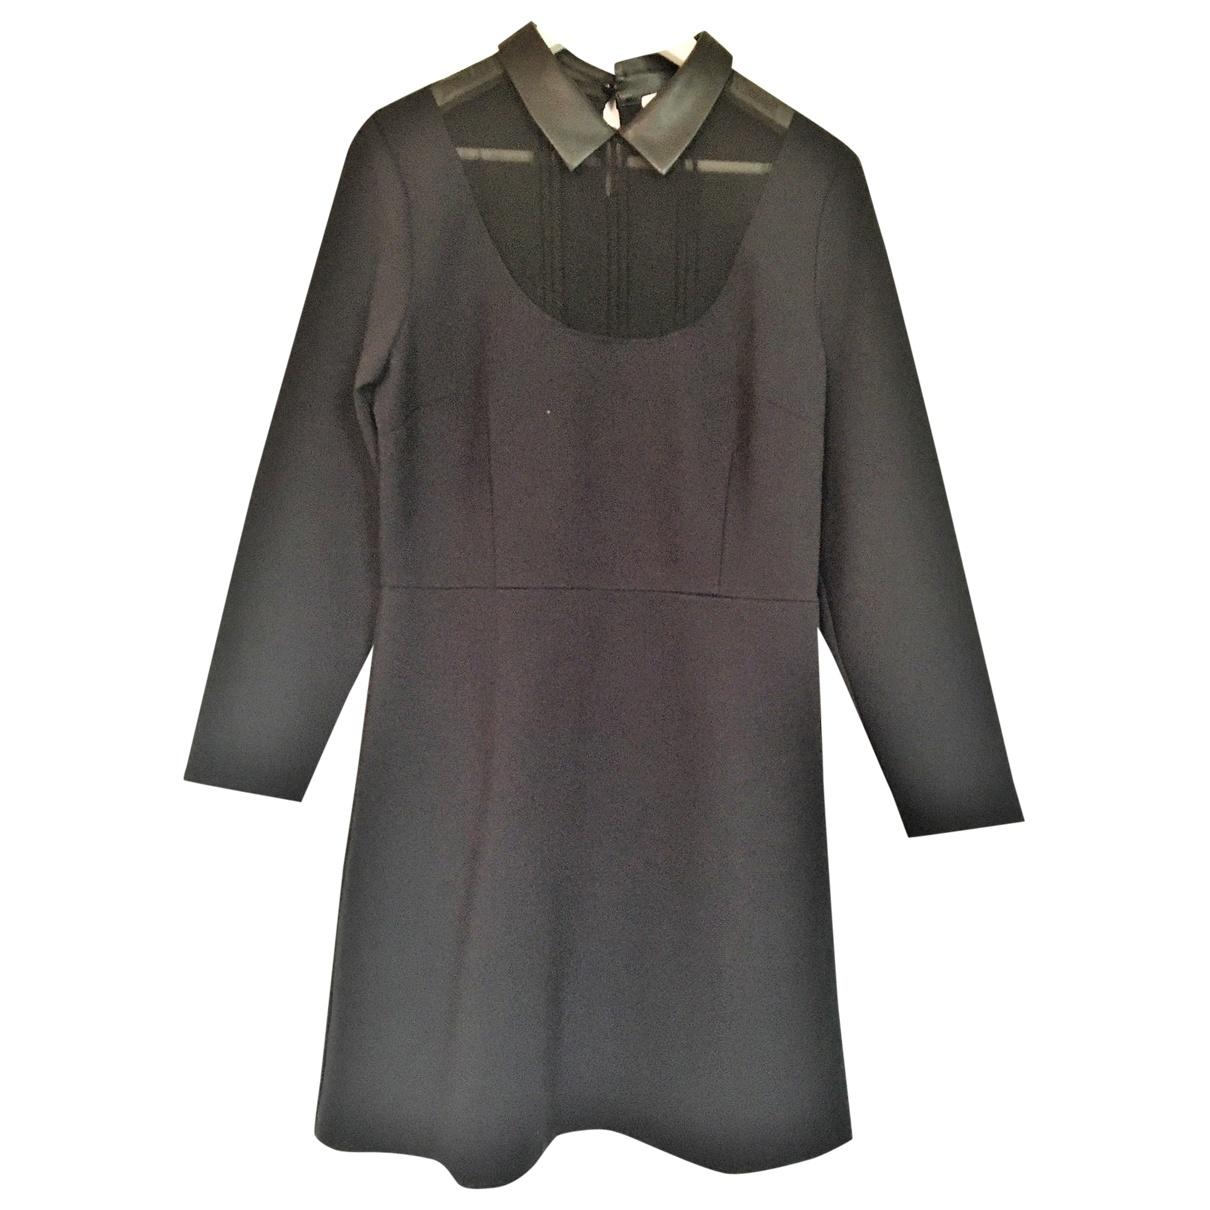 Zapa \N Black dress for Women 42 FR